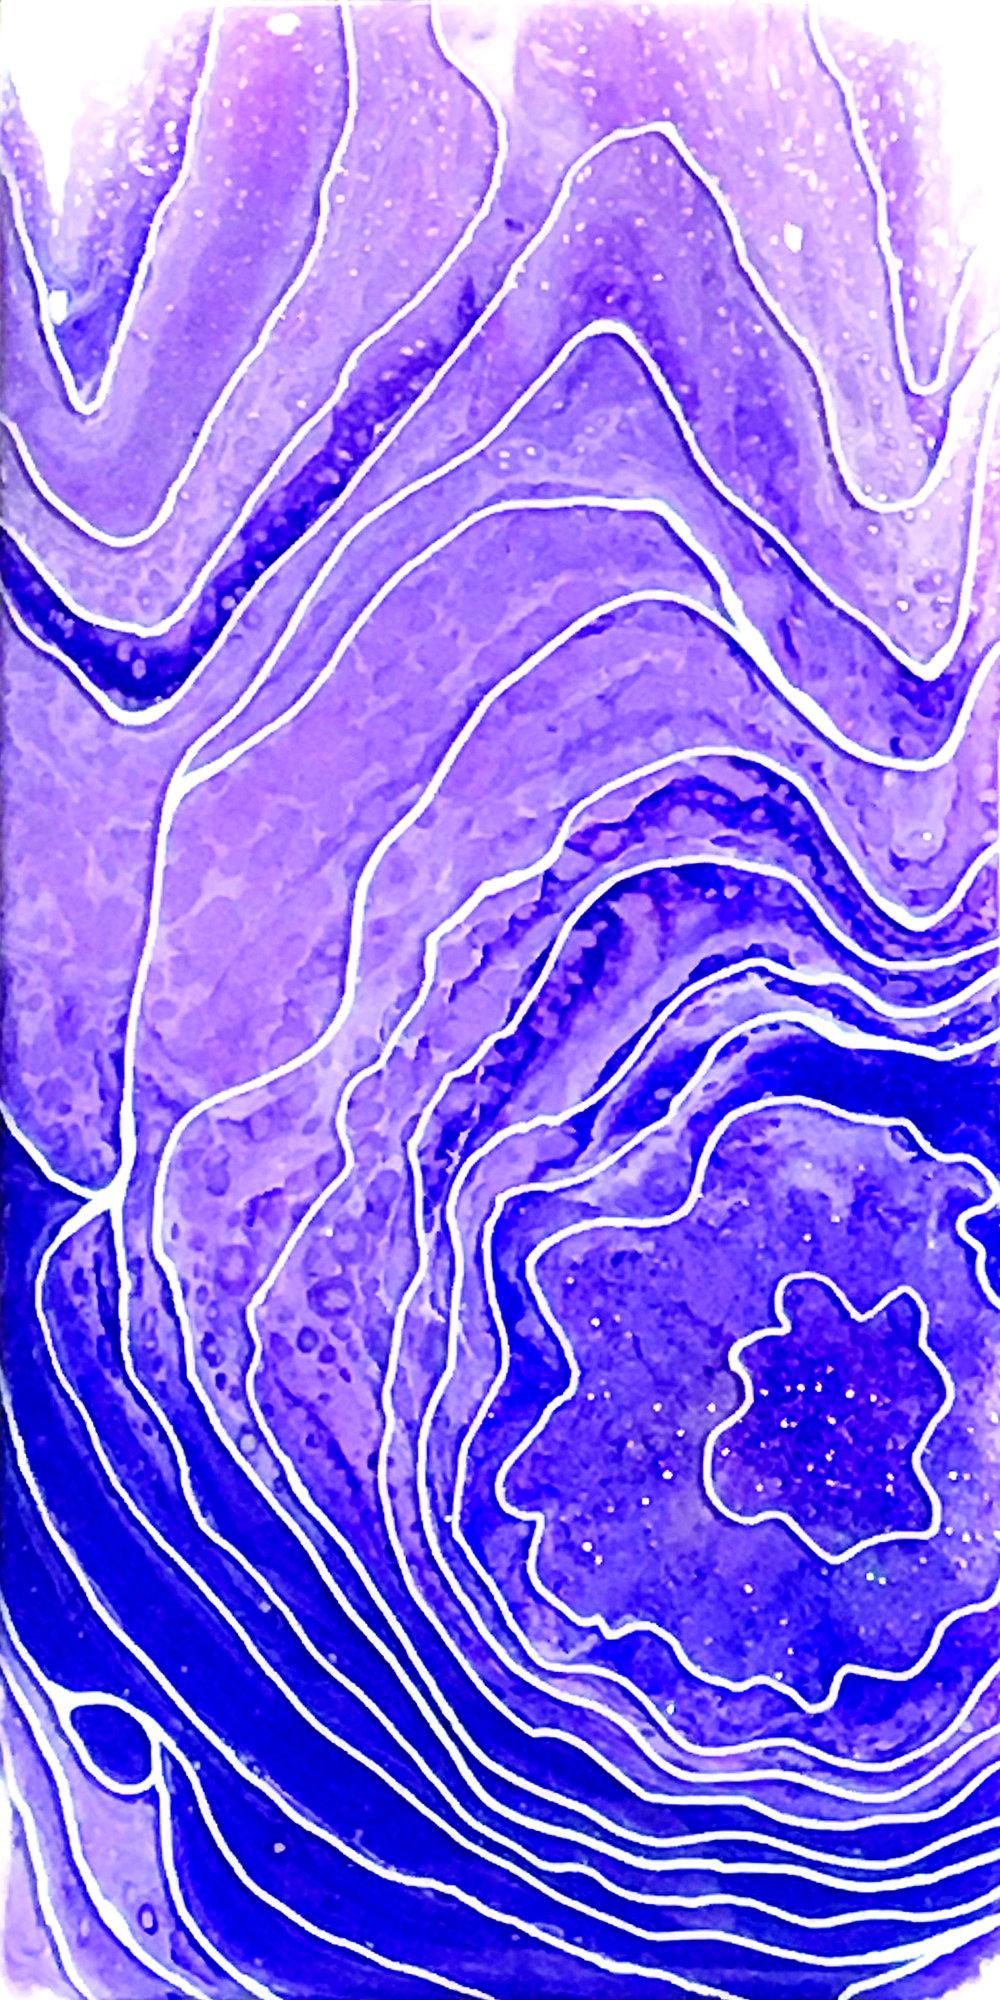 9 HUEGallery_AEvans_Sparkling Sugilite_6x12_AcrylicAndResinOnBirchPanel_2018_$250.jpg